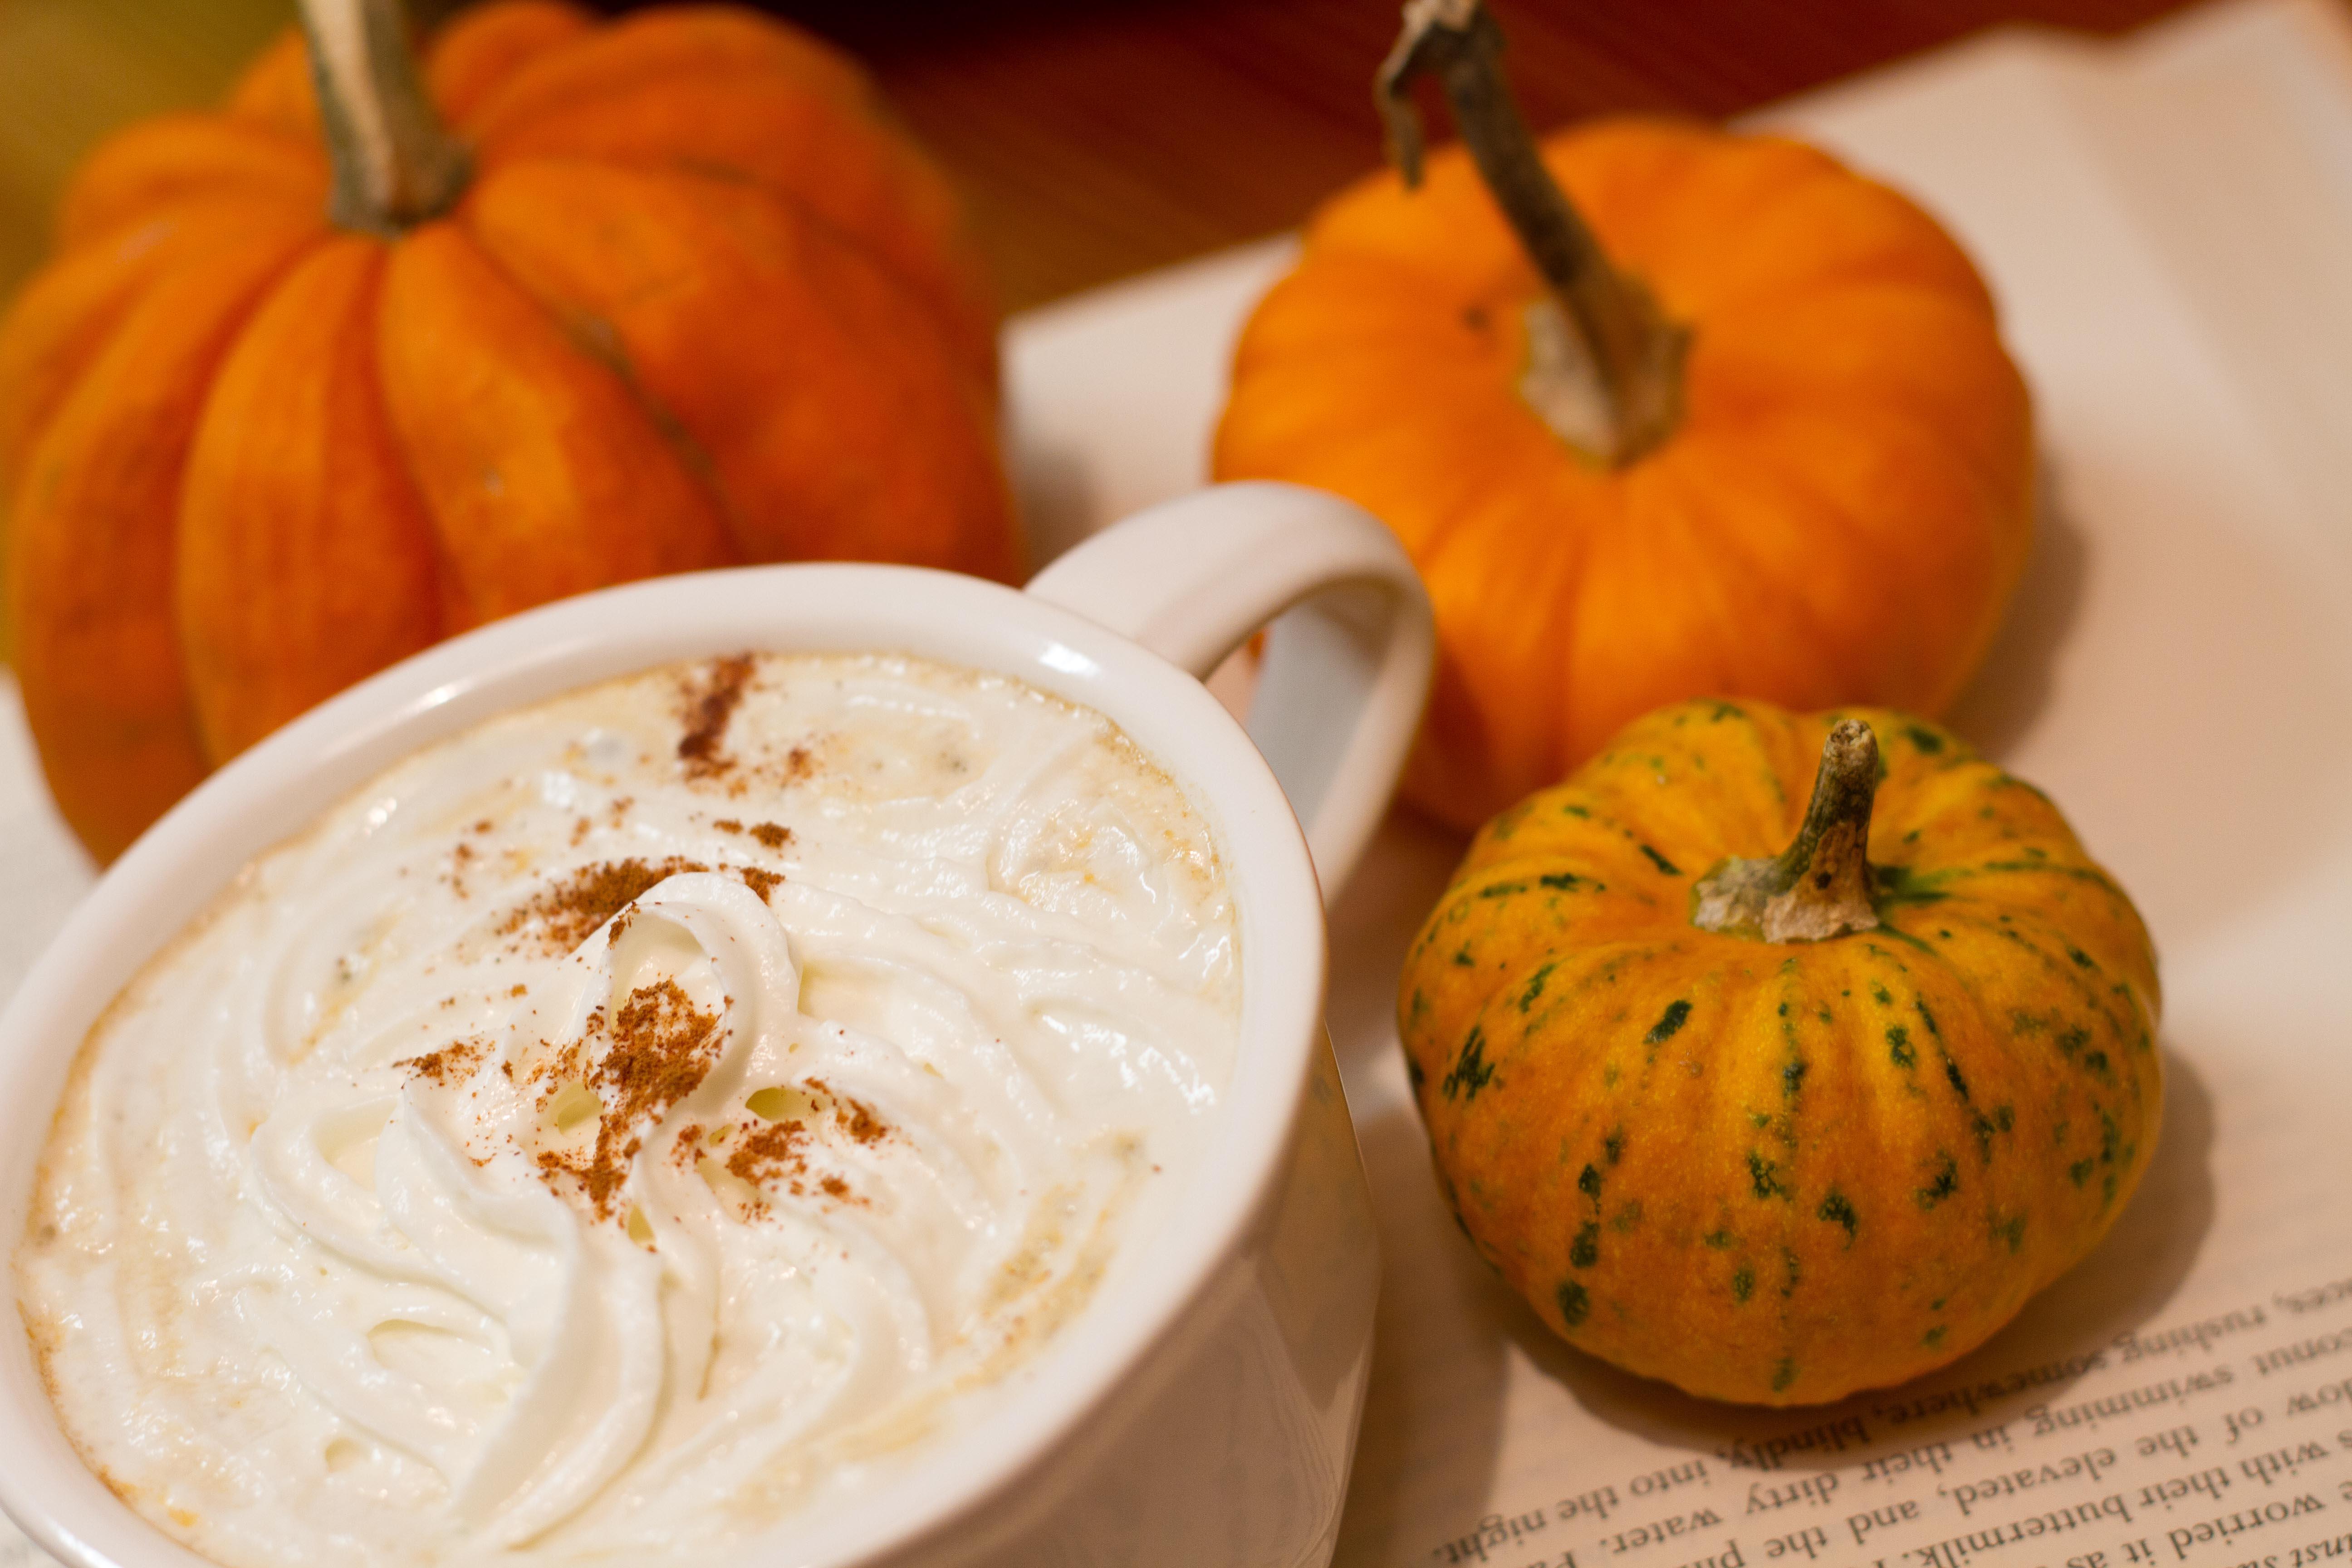 Fall Down Wallpaper Pumpkin Spice Latte Invictus Fitness